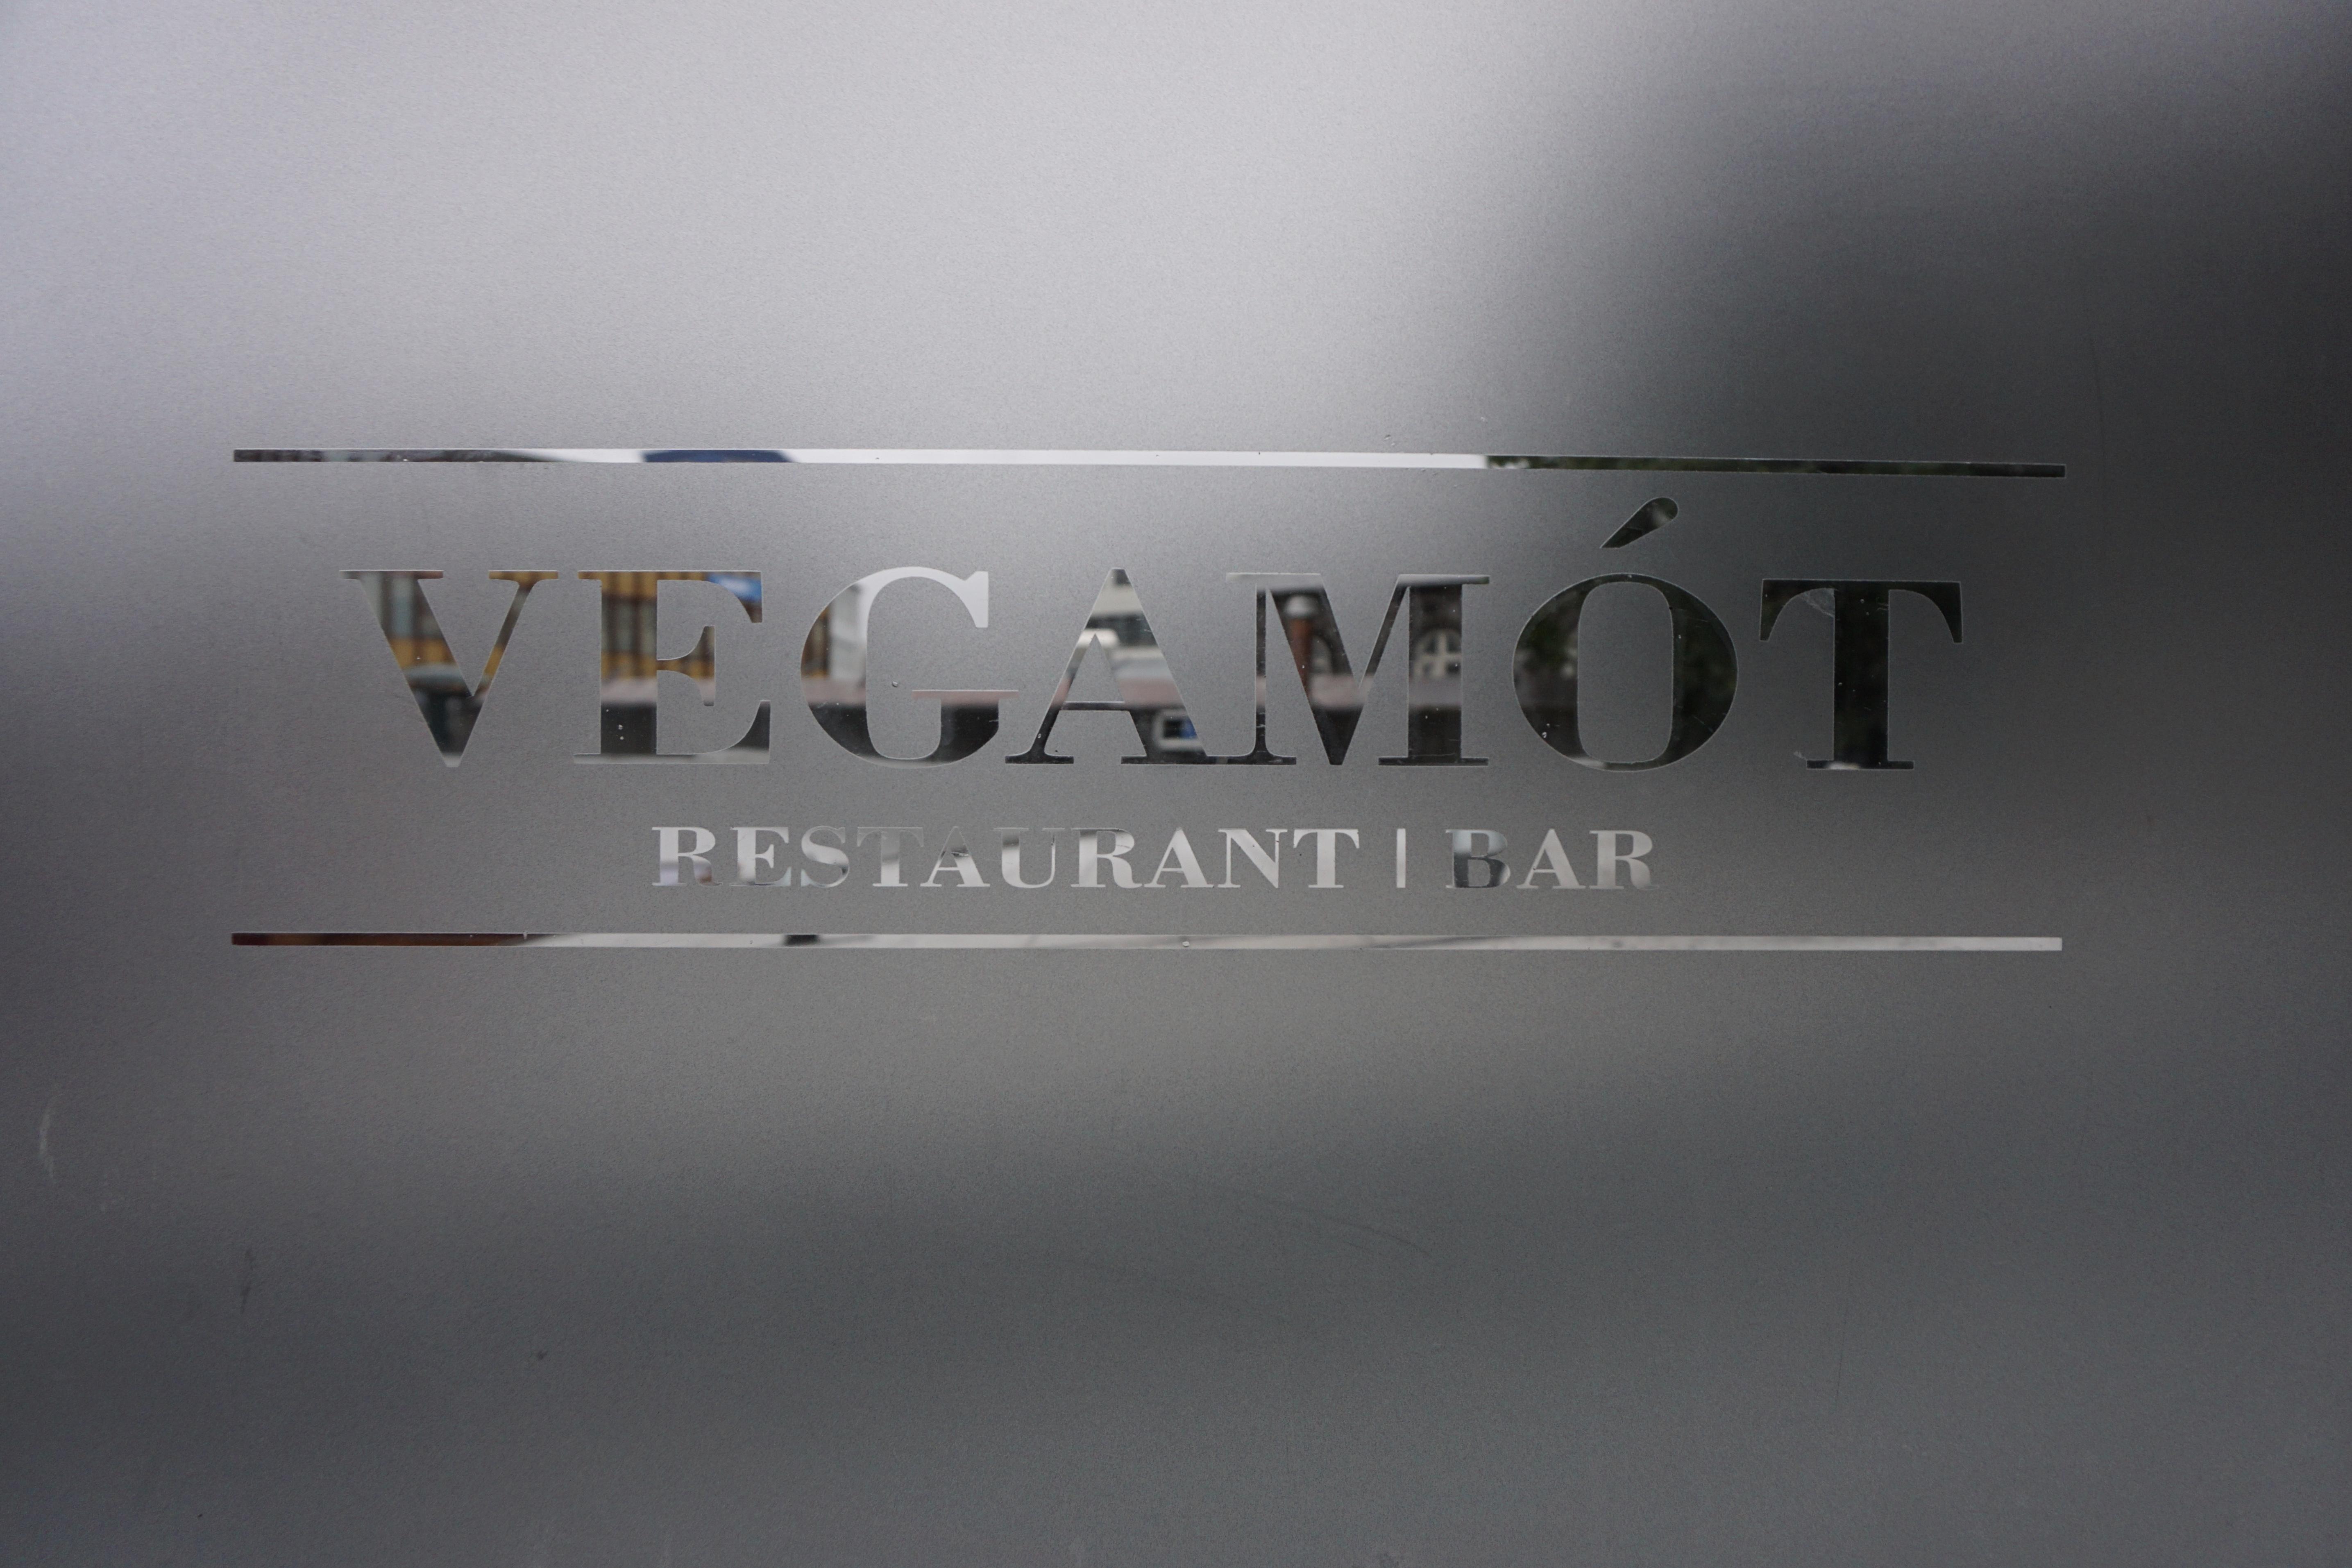 Vegamót in Reykjavik, Iceland